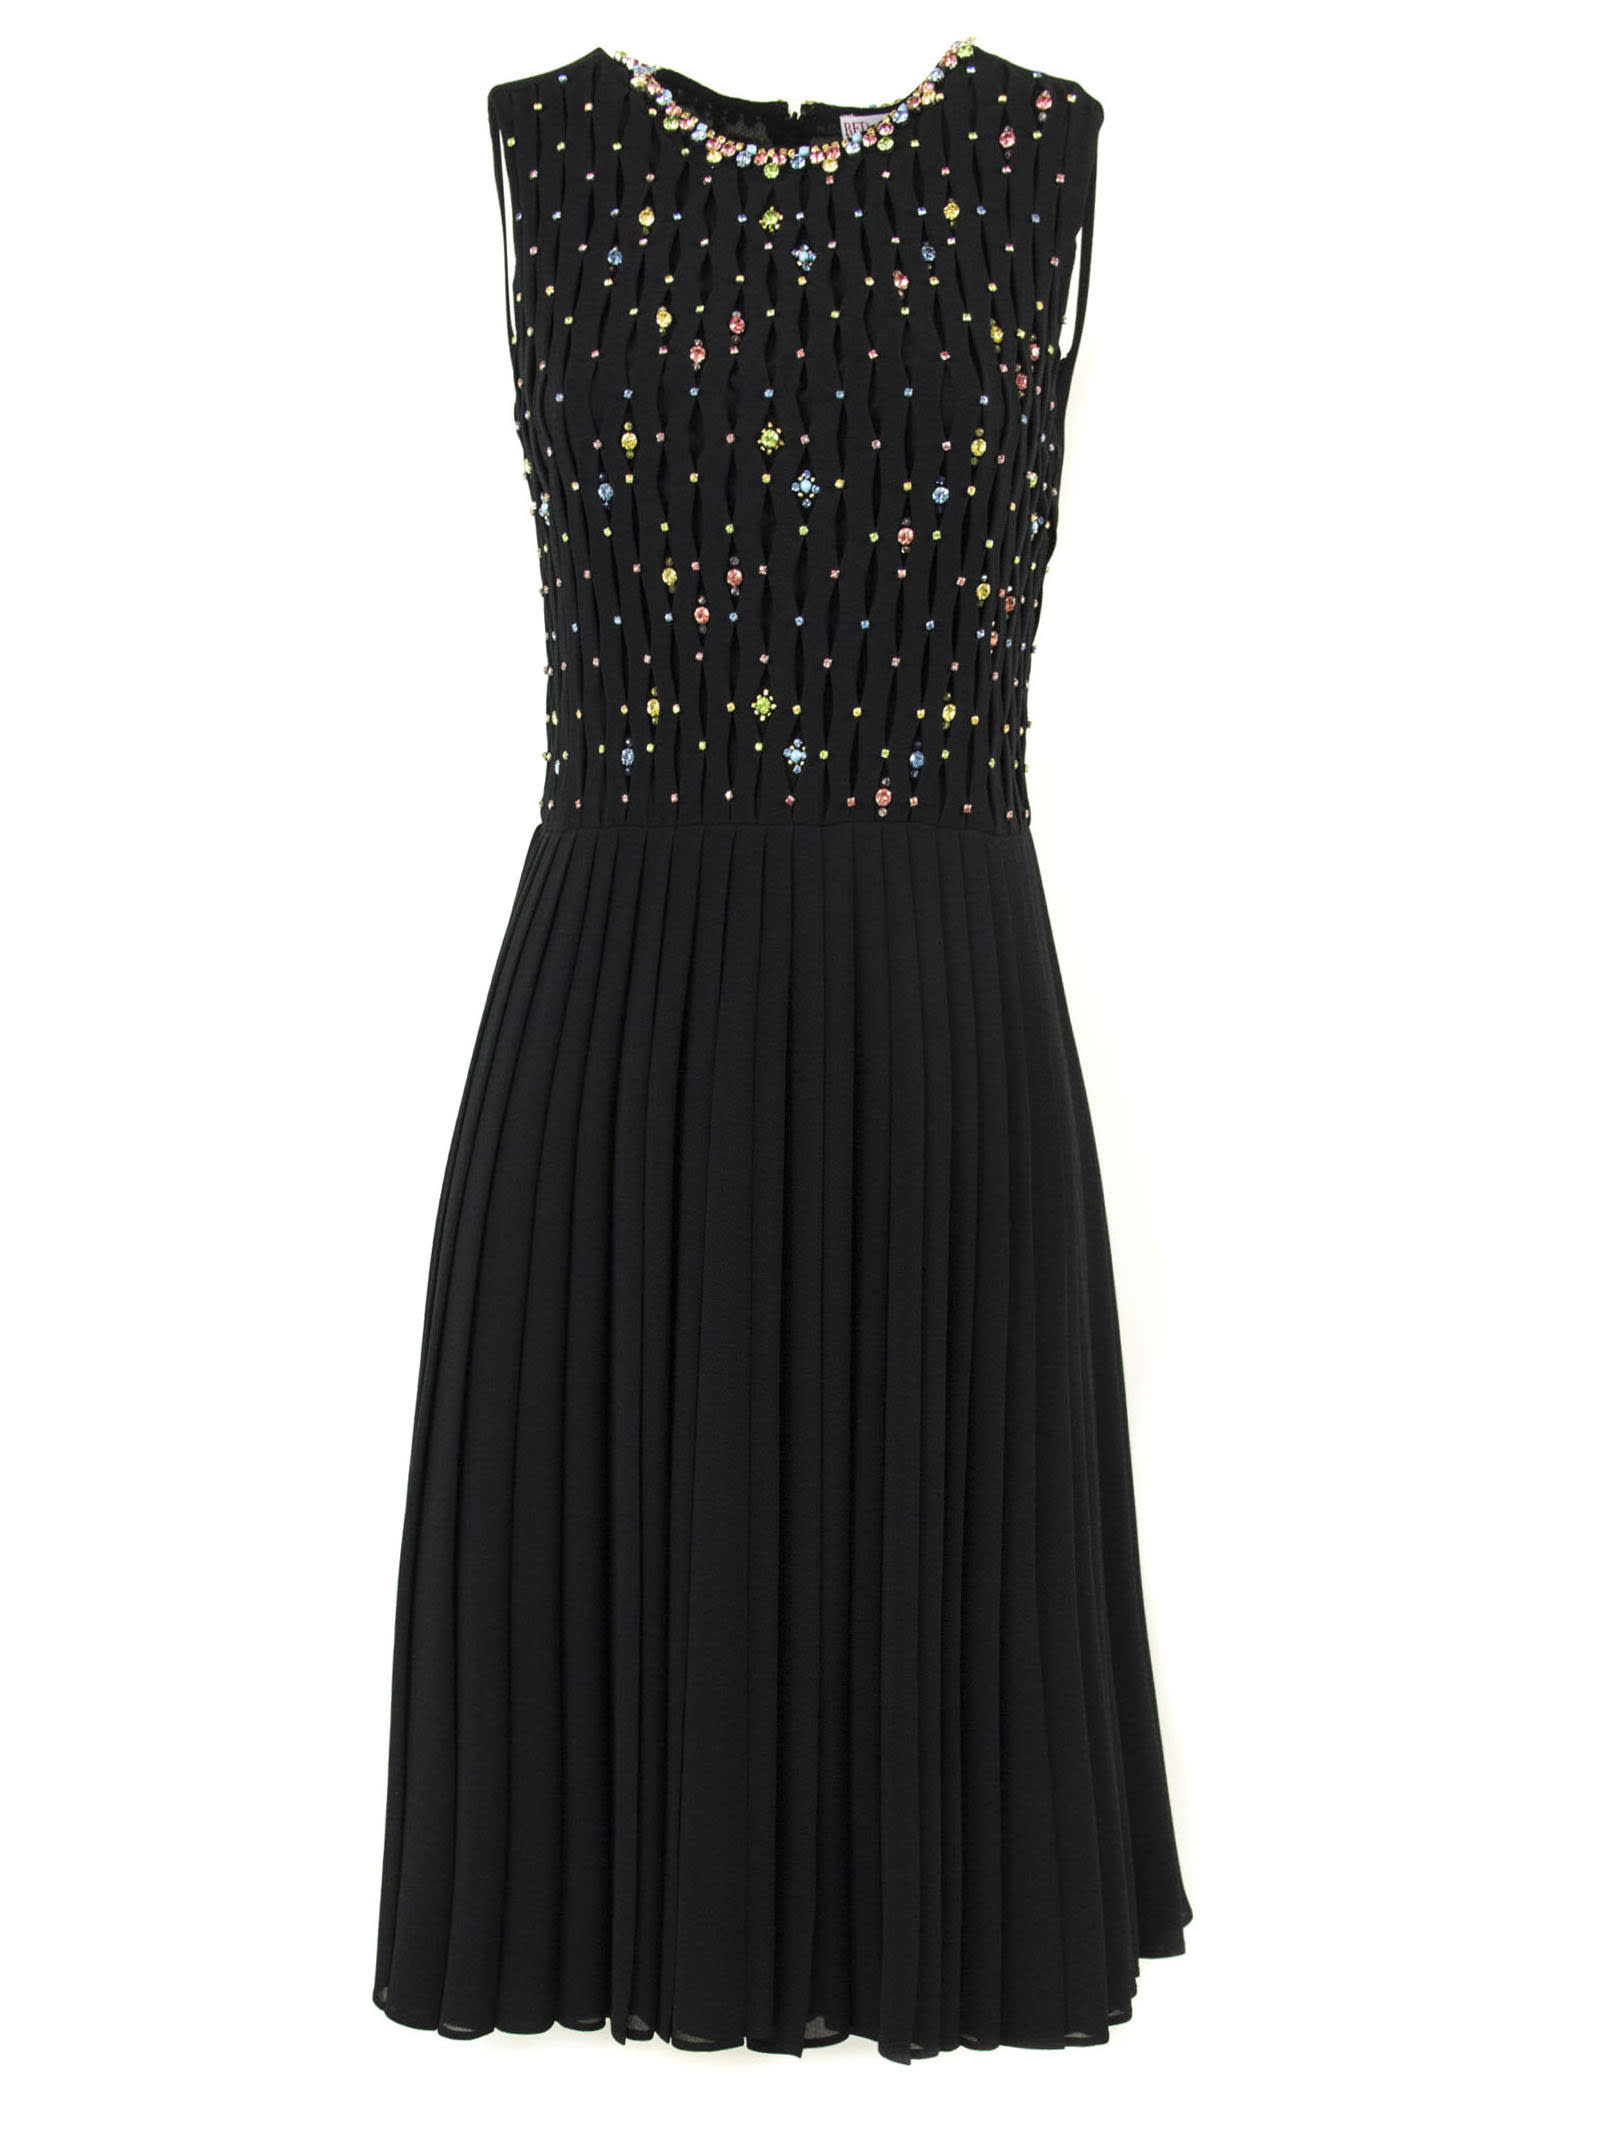 RED Valentino Black Fabric Dress